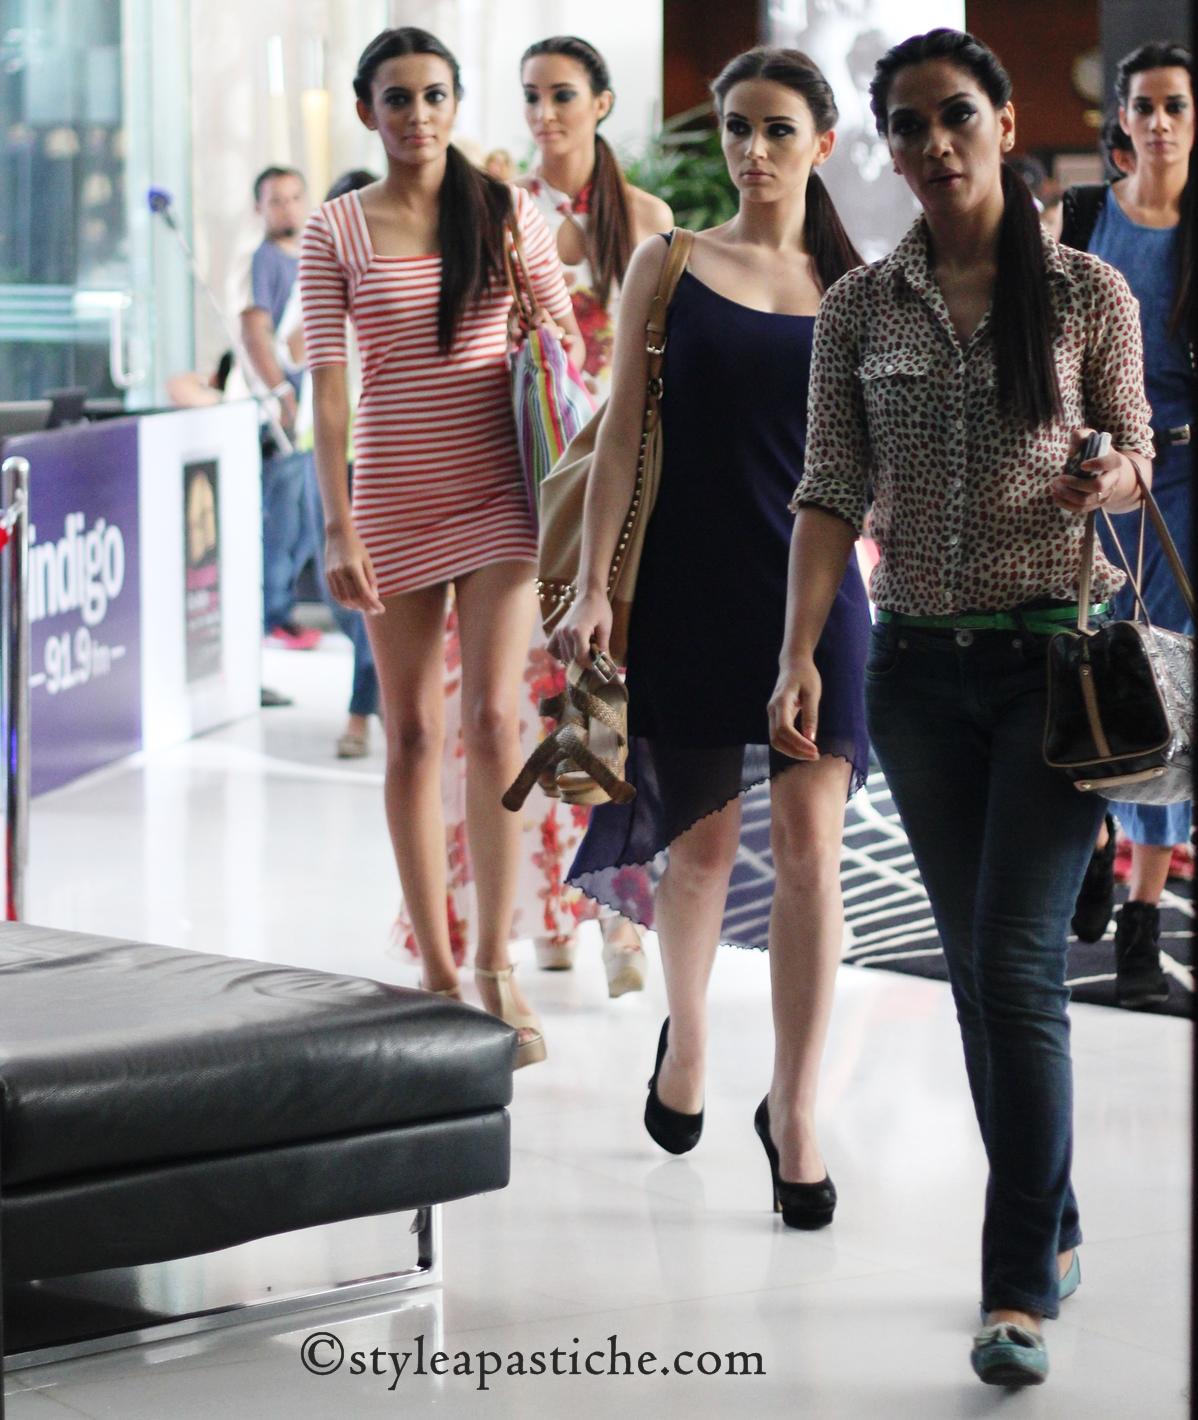 Model, BFW Street Style, Leopard Prints, Assymetric Sheer Dress, Nautical Prints,